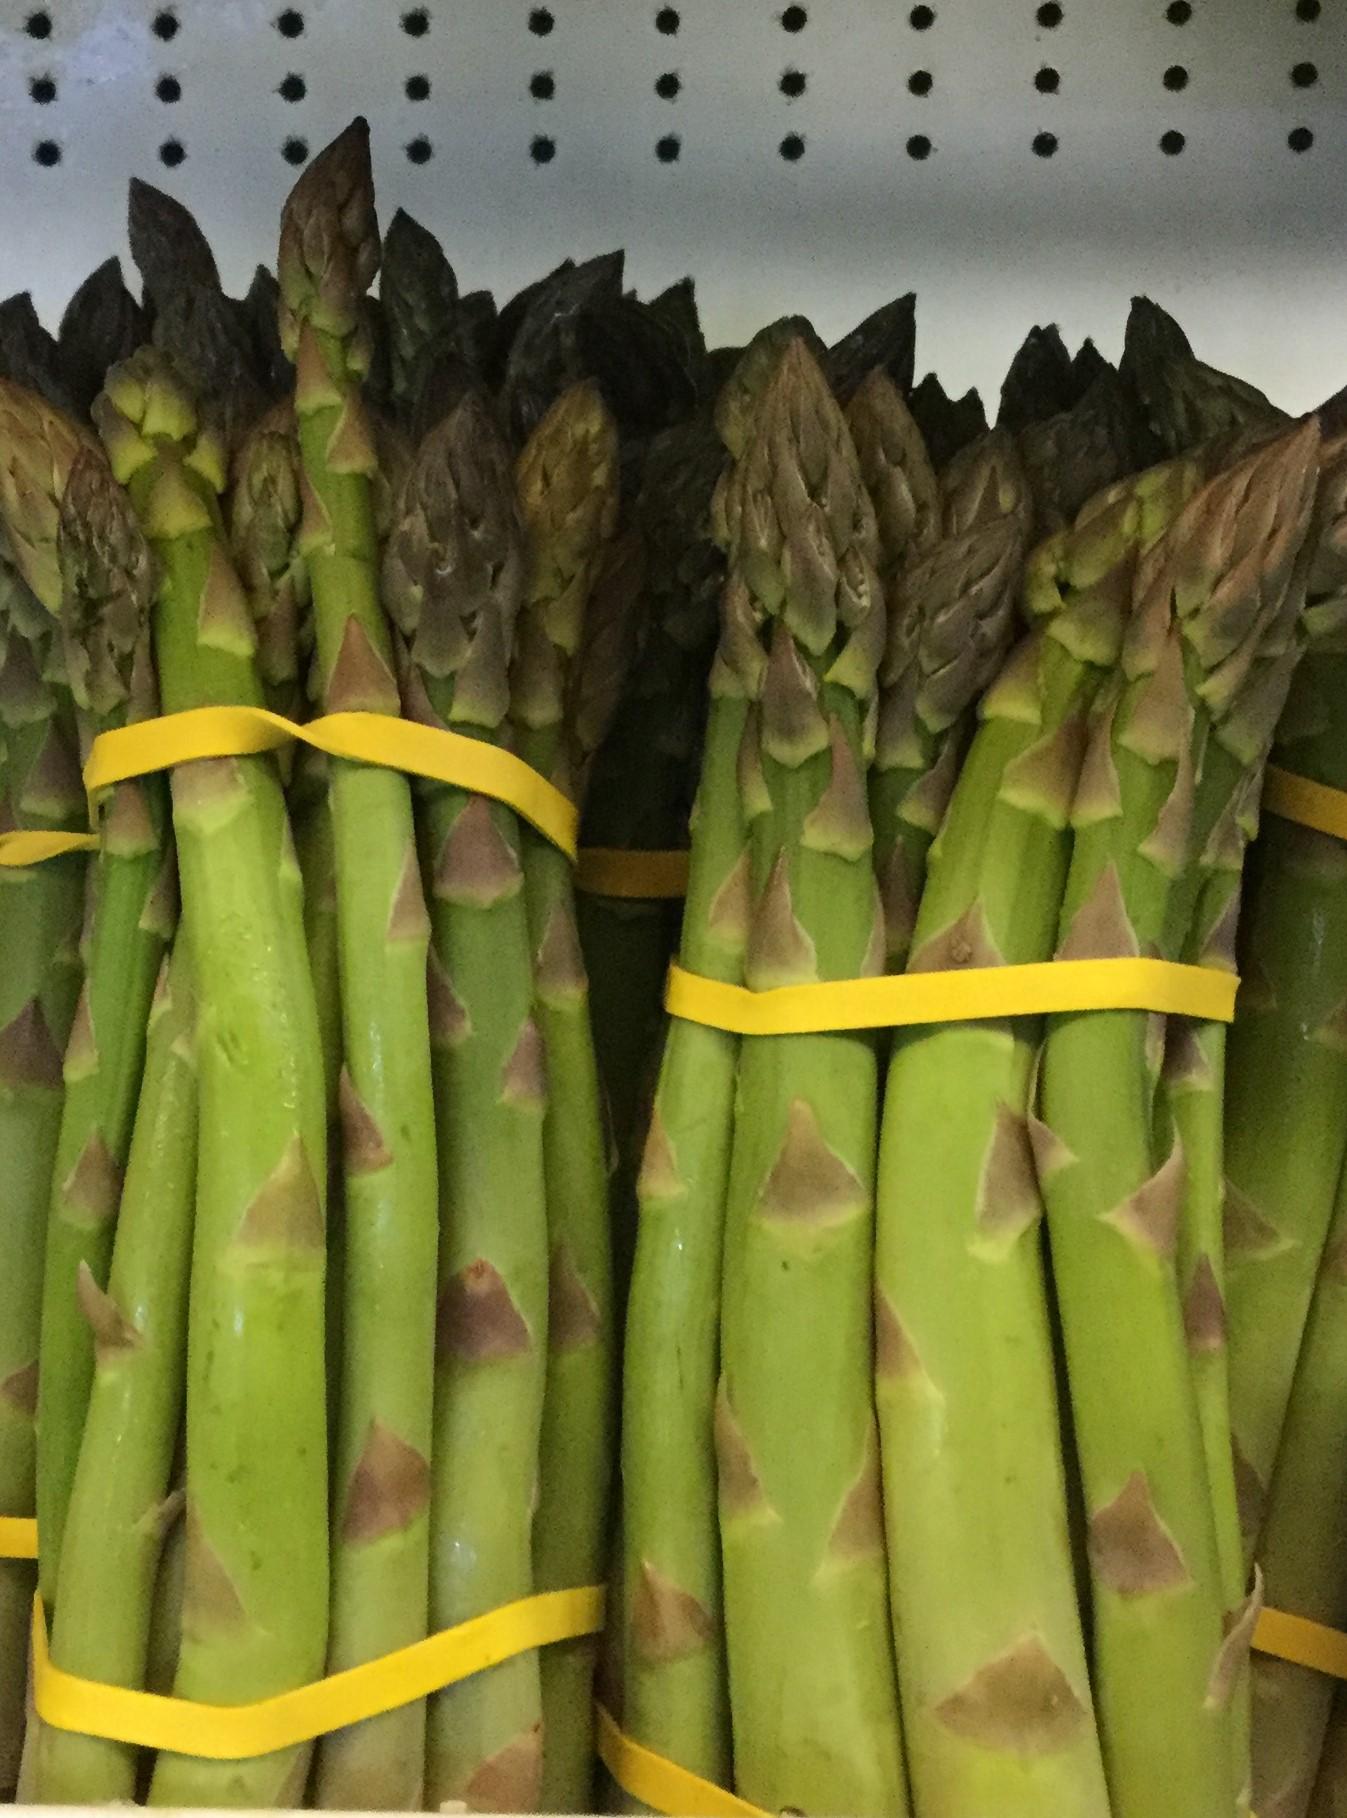 LOCAL Organic Asparagus